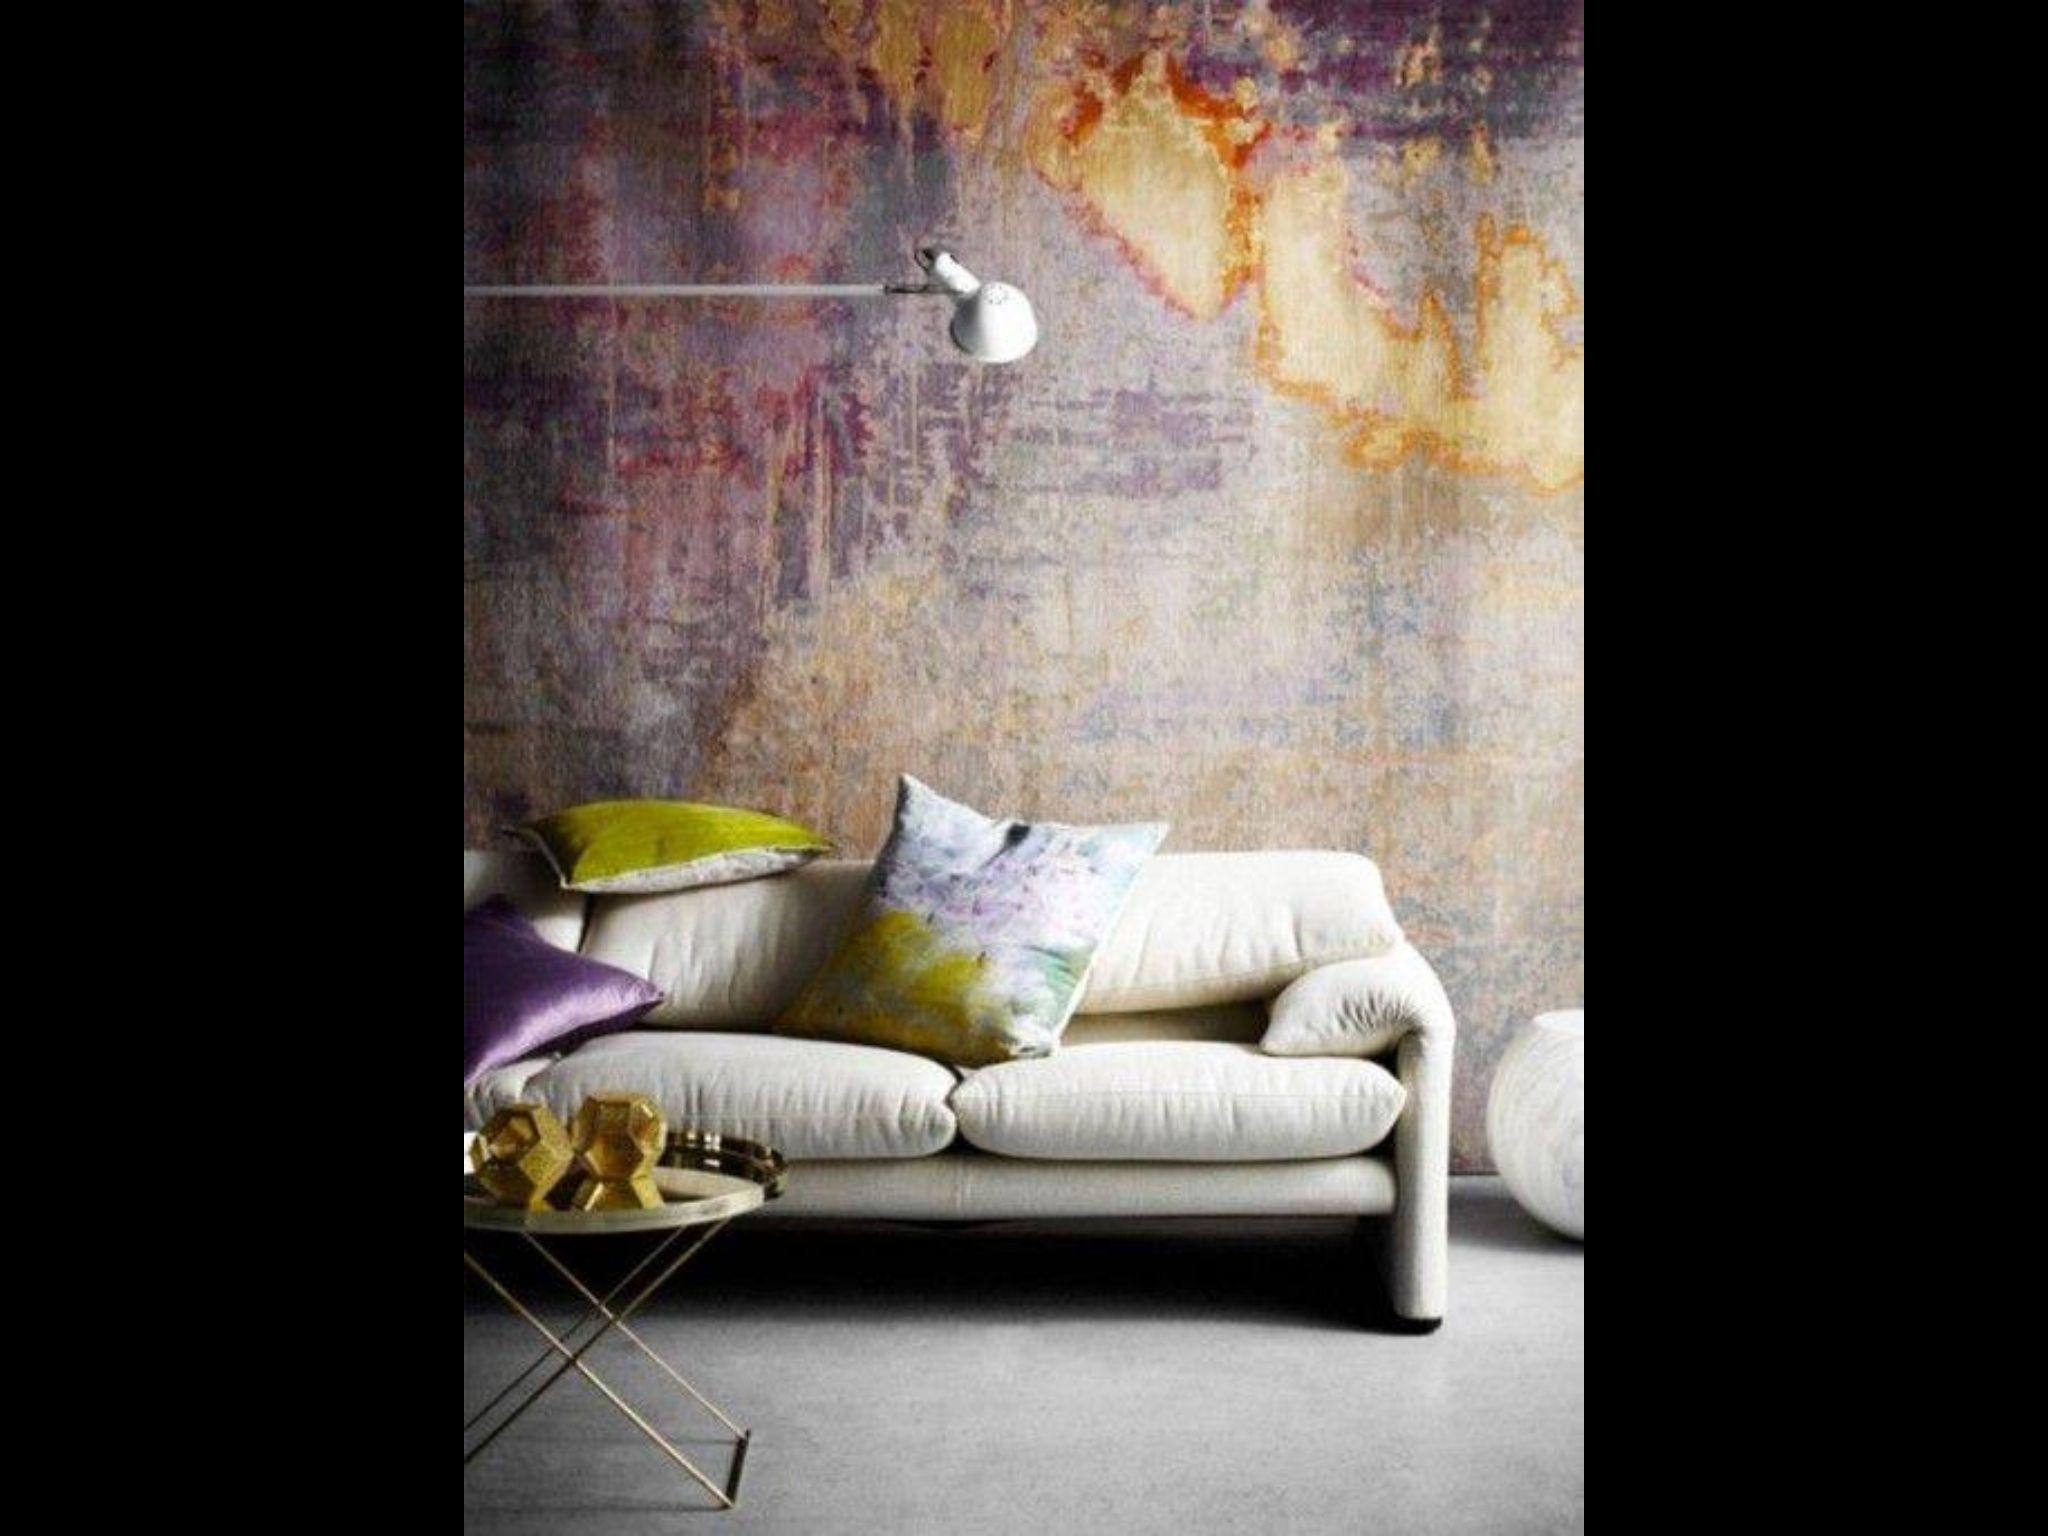 Pin De Yeison Cifuentes En Interior Design Pinterest ~ Pintura Decorativa Paredes Interiores